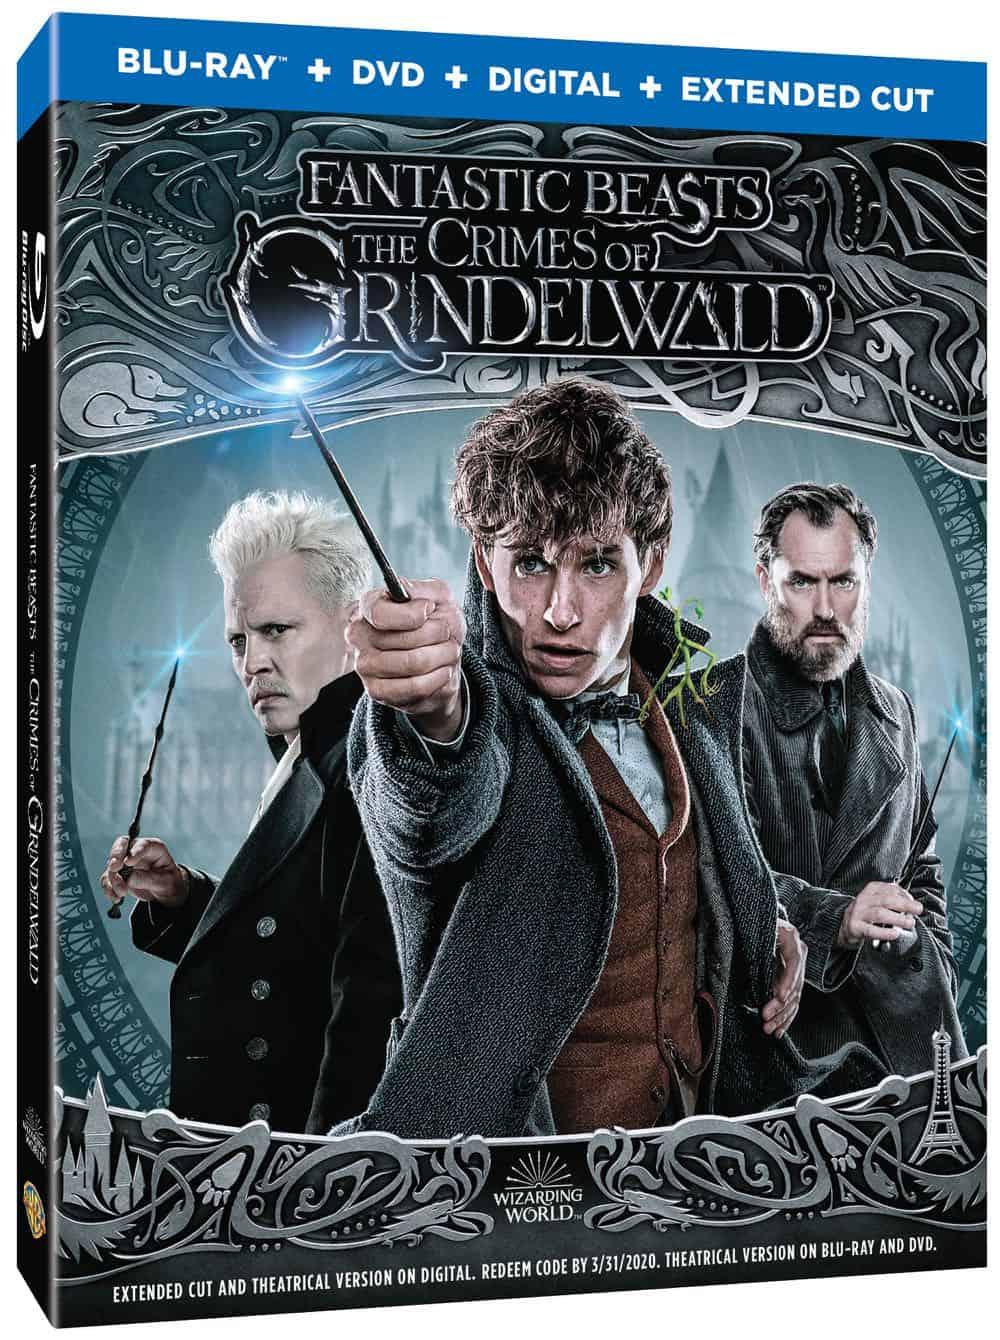 Fantastic Beasts The Crimes of Grindelwald 4K Bluray DVD Digital 4